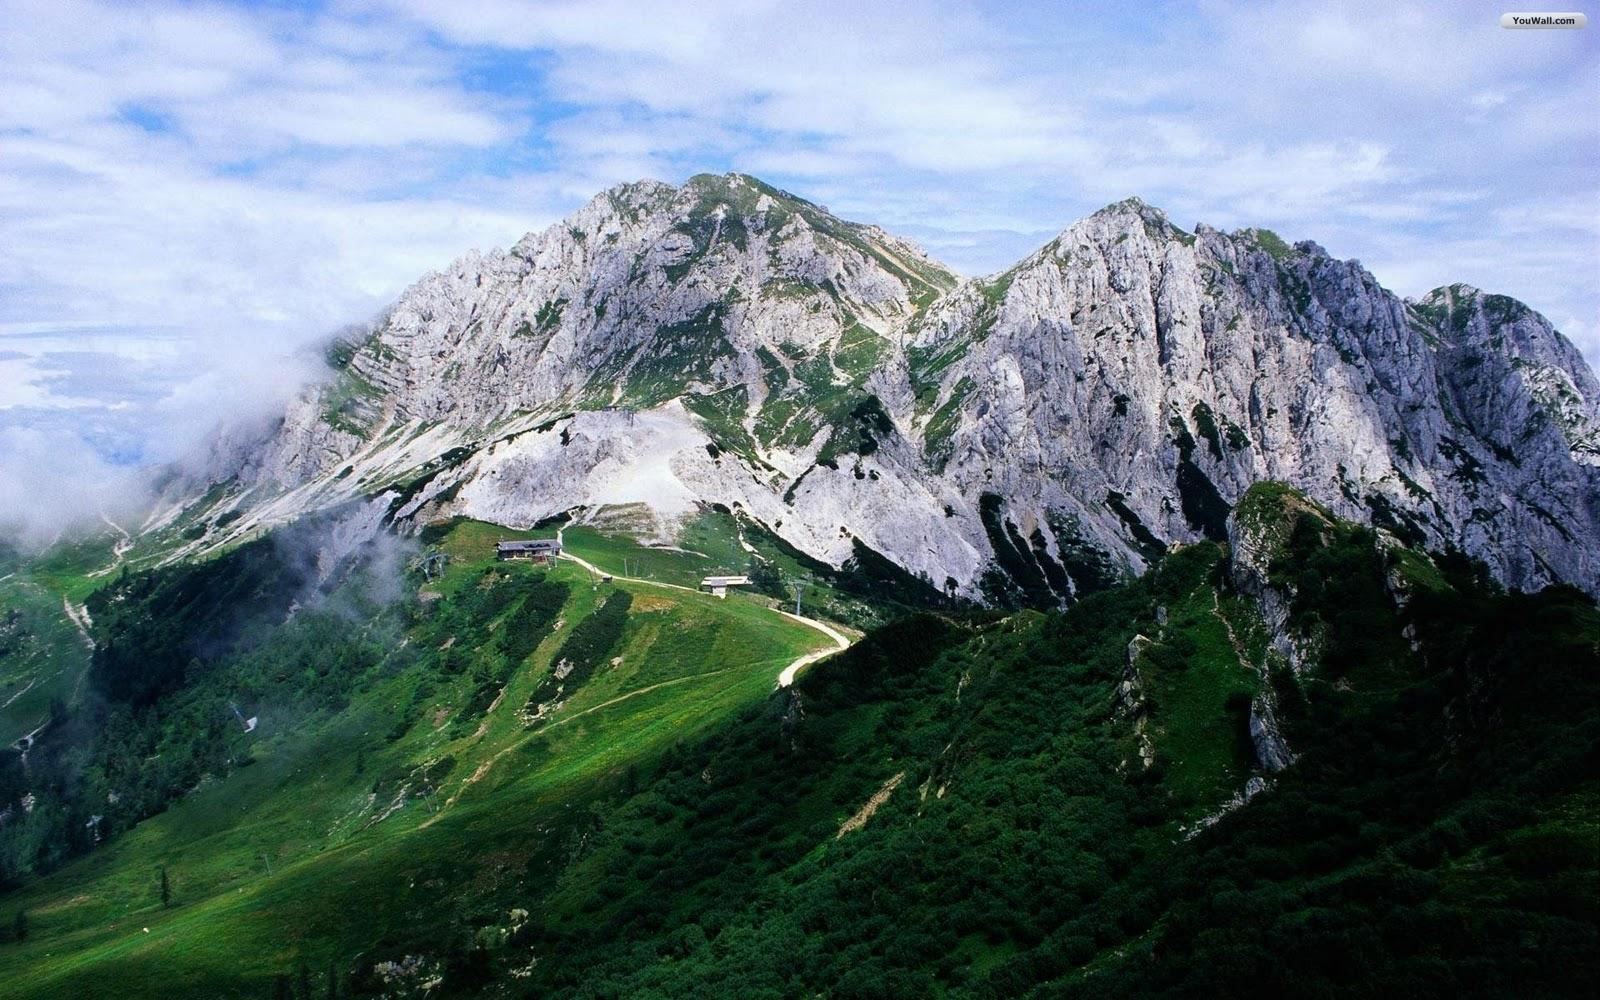 http://2.bp.blogspot.com/-ZwAgm2JHv8Y/Tulsf6P-VGI/AAAAAAAAAds/P8IkpIUuCc0/s1600/big_mountain_wallpaper_29b8a.jpg